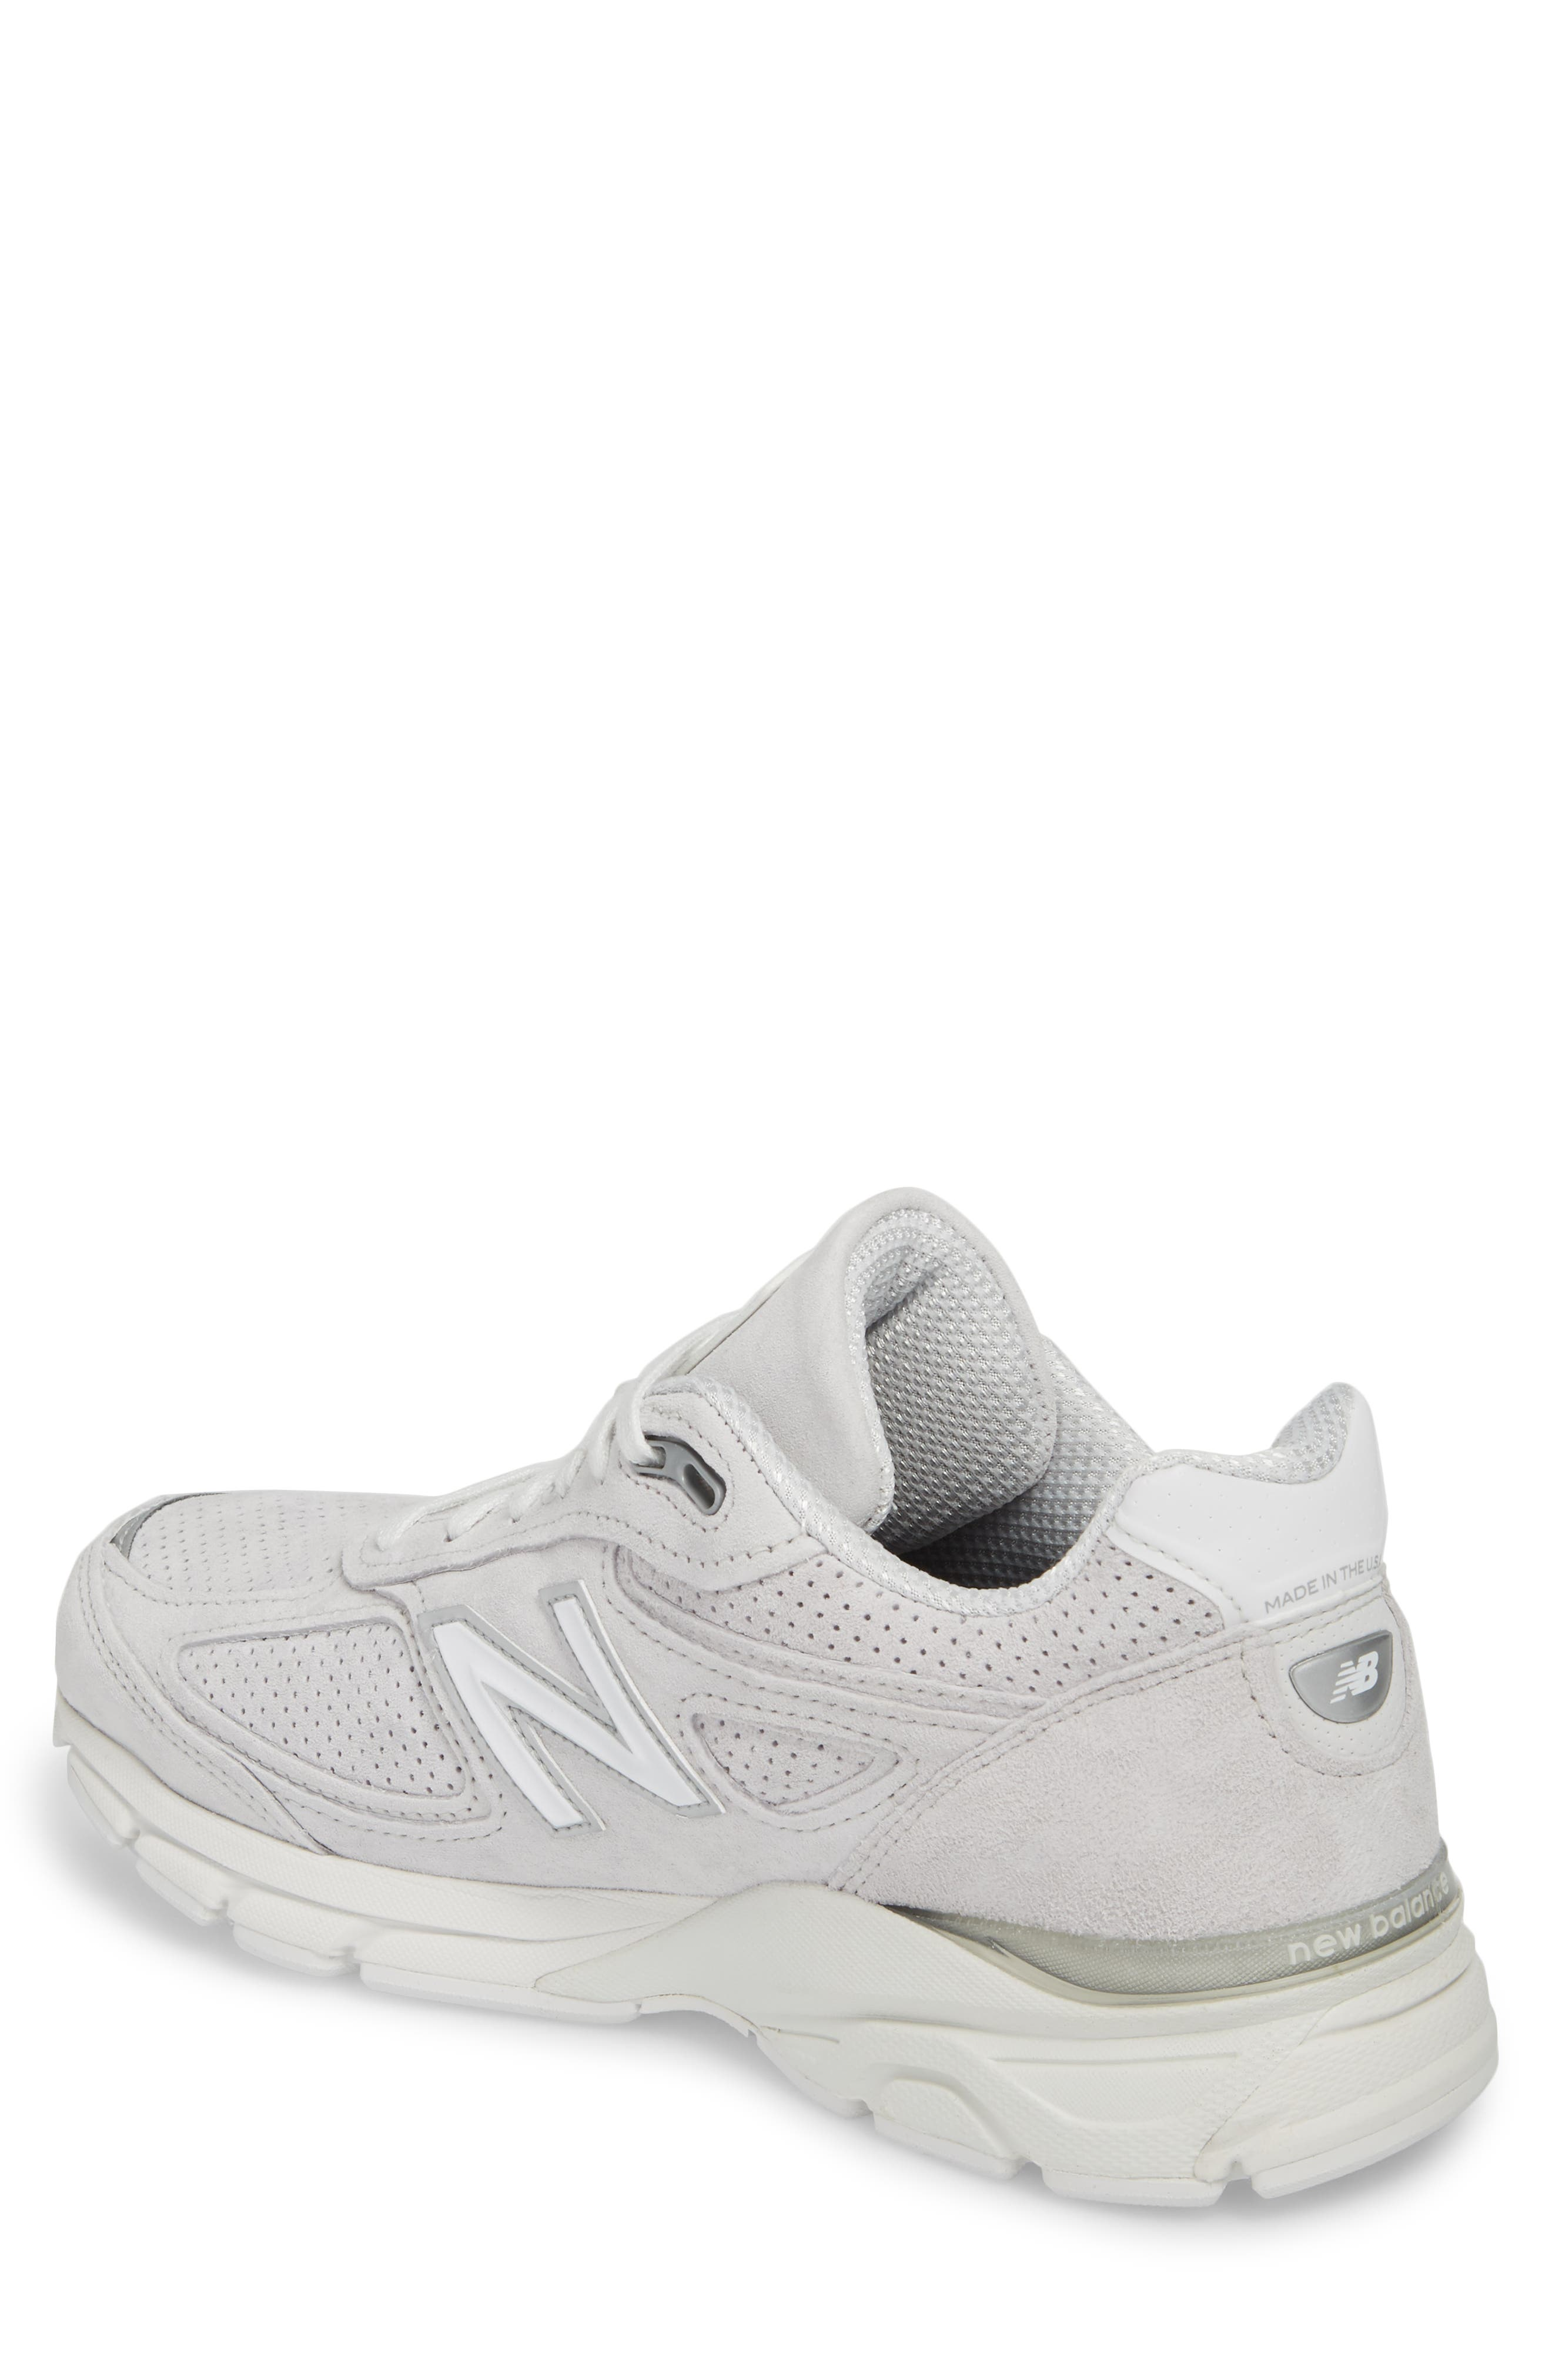 990v4 Perforated Sneaker,                             Alternate thumbnail 2, color,                             034